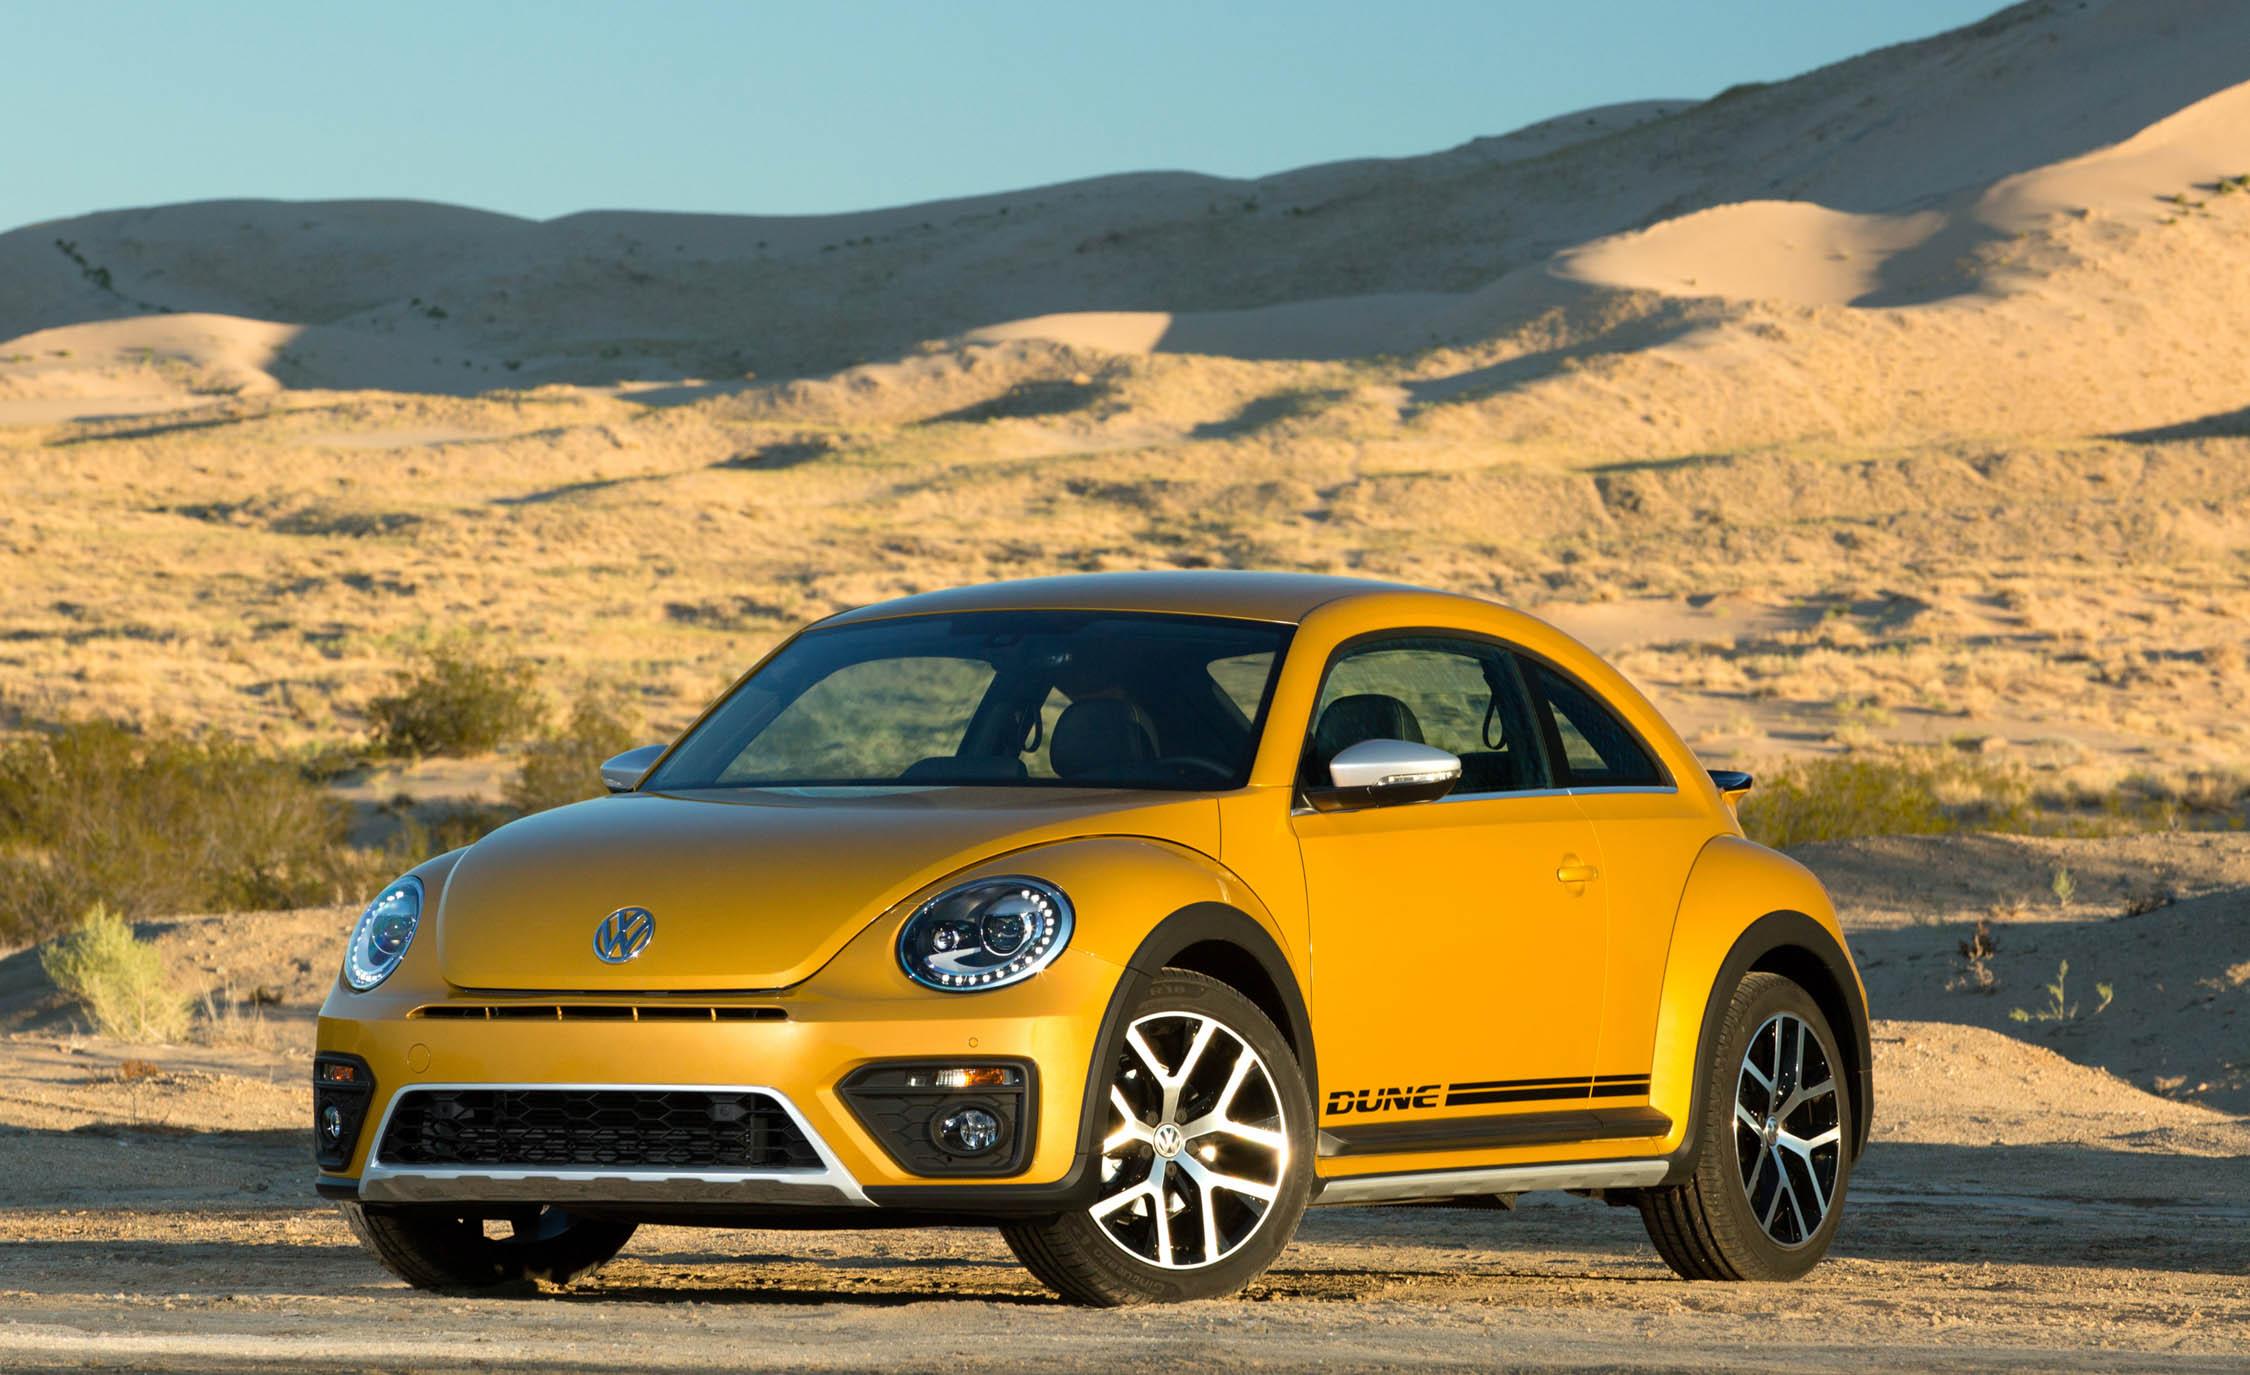 2016 Volkswagen Beetle Dune Exterior Full Front and Side